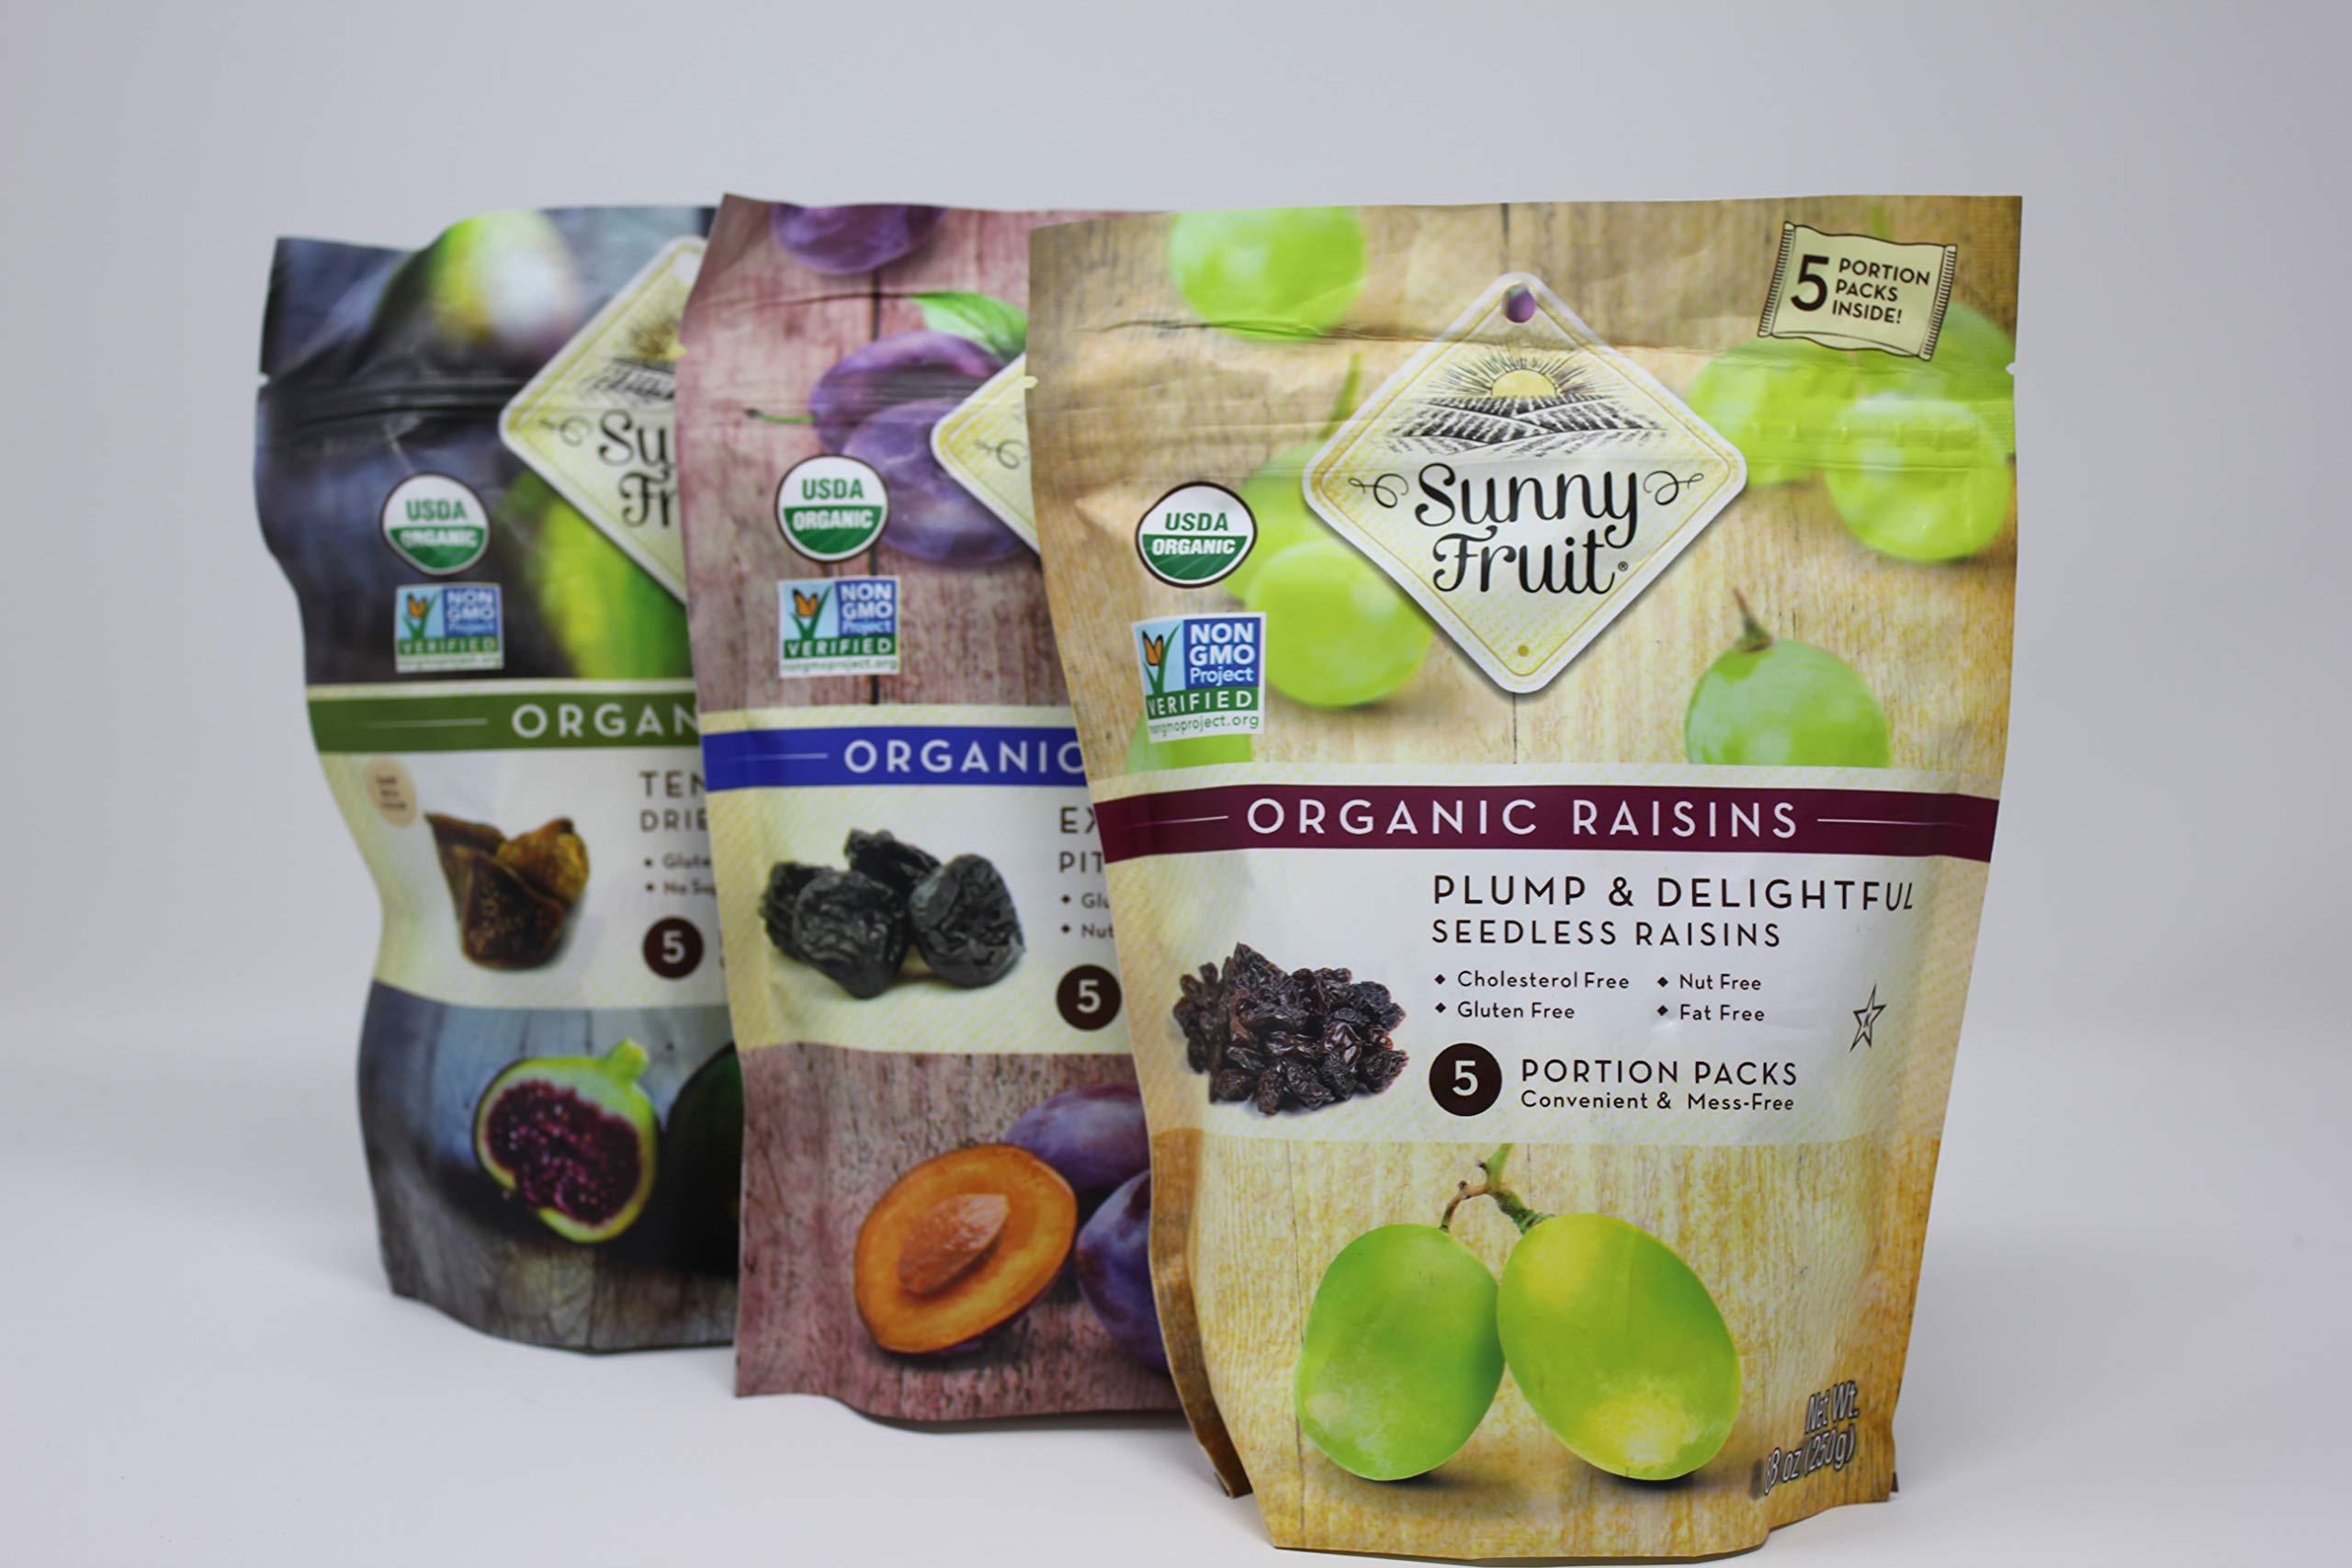 Organic Dried Fruit Variety Pack - Sunny Fruit - (6) Bags - (5) 1.76 oz. Portion Packs Per Bag | Smyrna Figs, Dried Plums, Raisins | No Added Sugar, Non GMO, Kosher, Vegan | No Preservatives by SunnyFruit